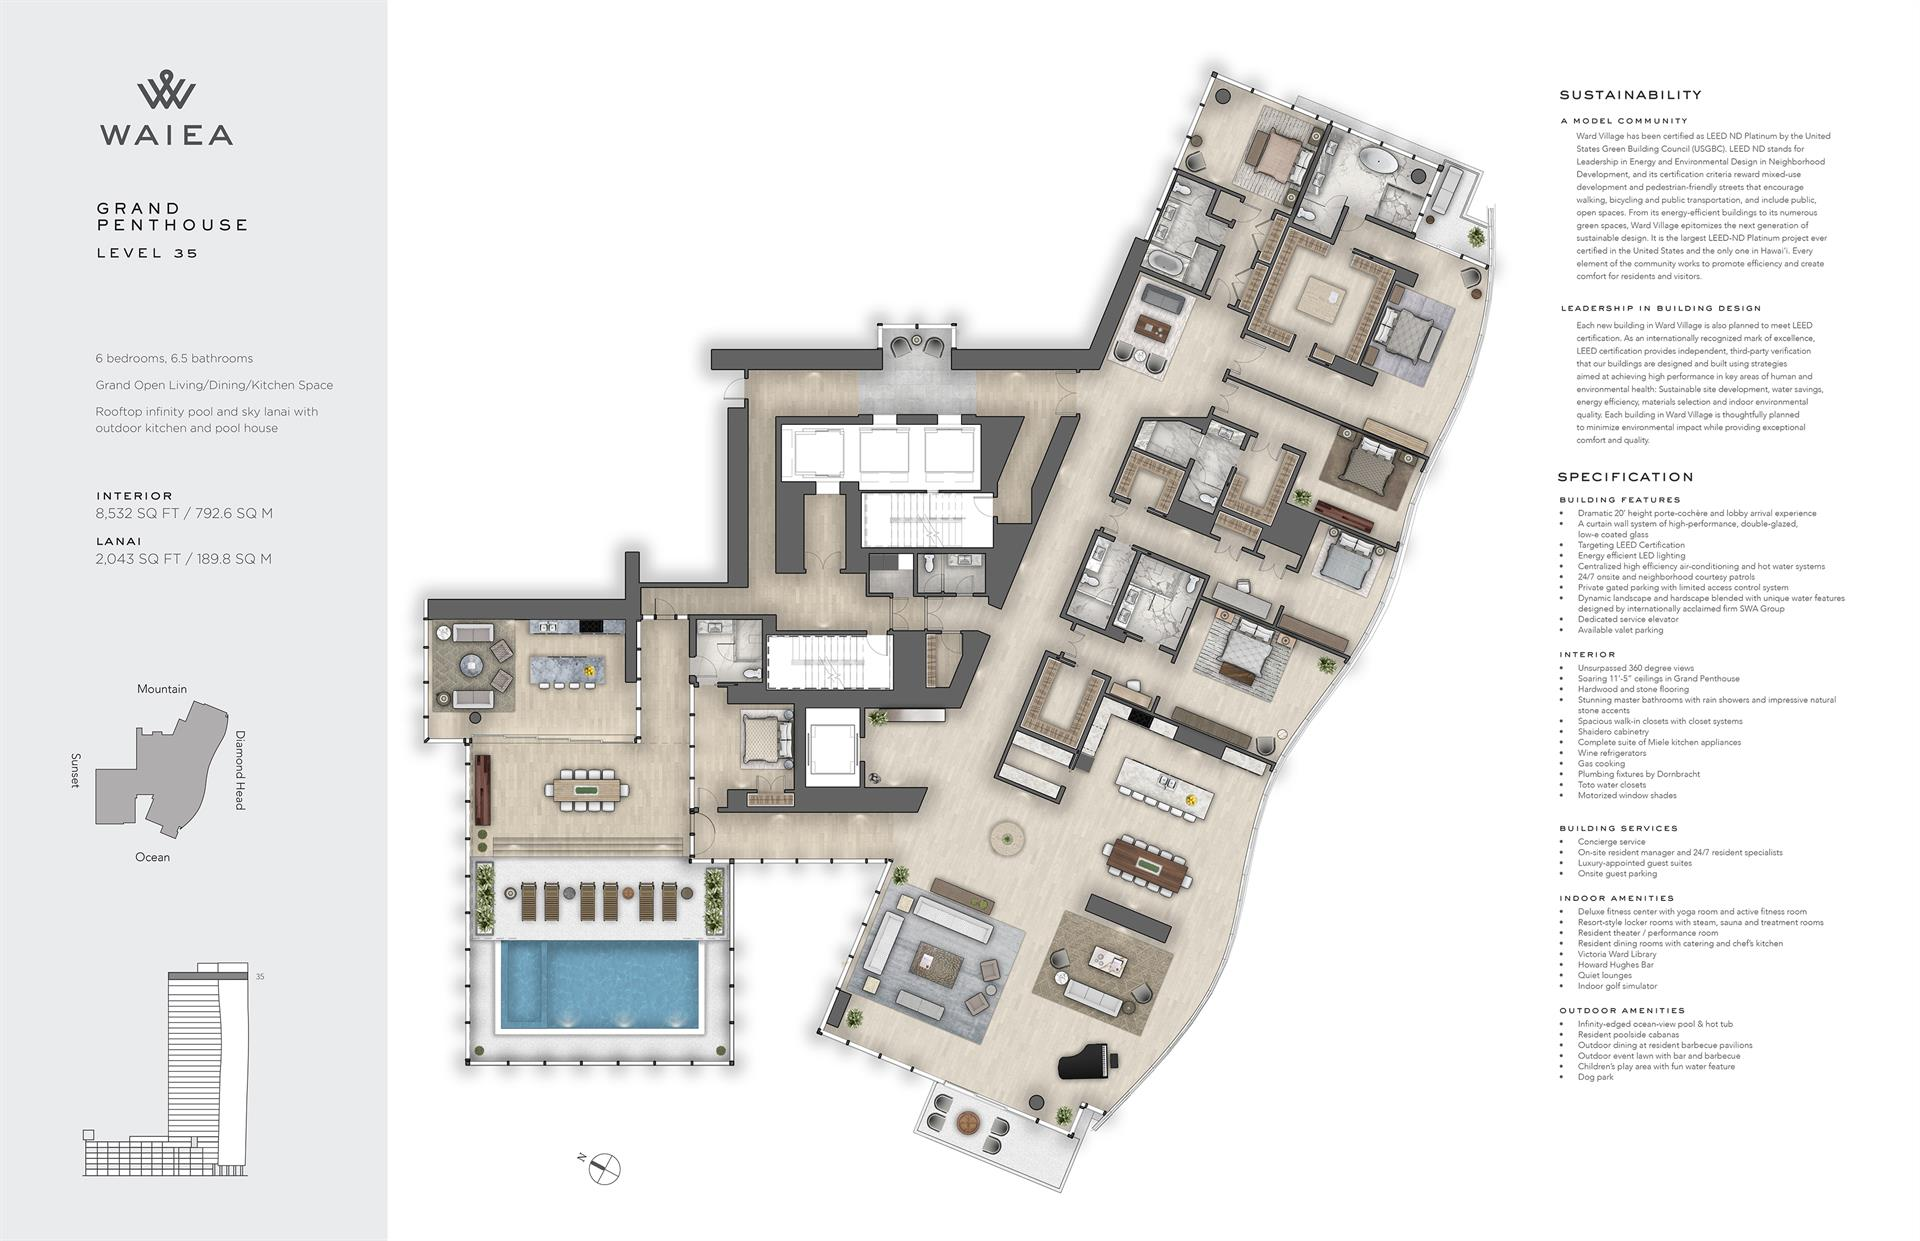 Condominium for Sale at Majestic Waiea Grand Penthouse 1118 Ala Moana Boulevard #GPH 35 Honolulu, Hawaii 96814 United States